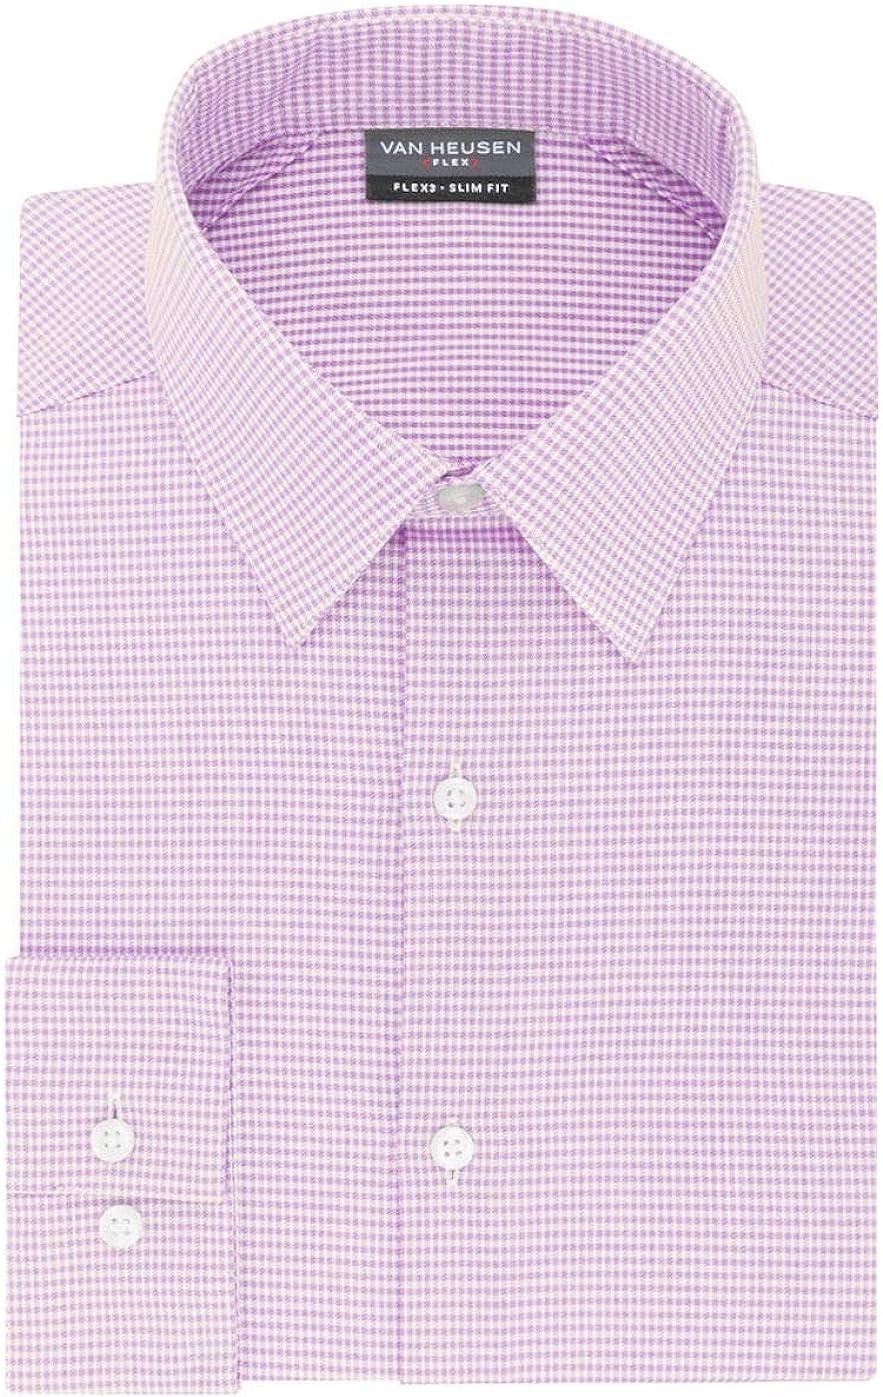 Van Heusen Men's Flex 3 Slim Fit 4-Way Stretch Dress Shirt